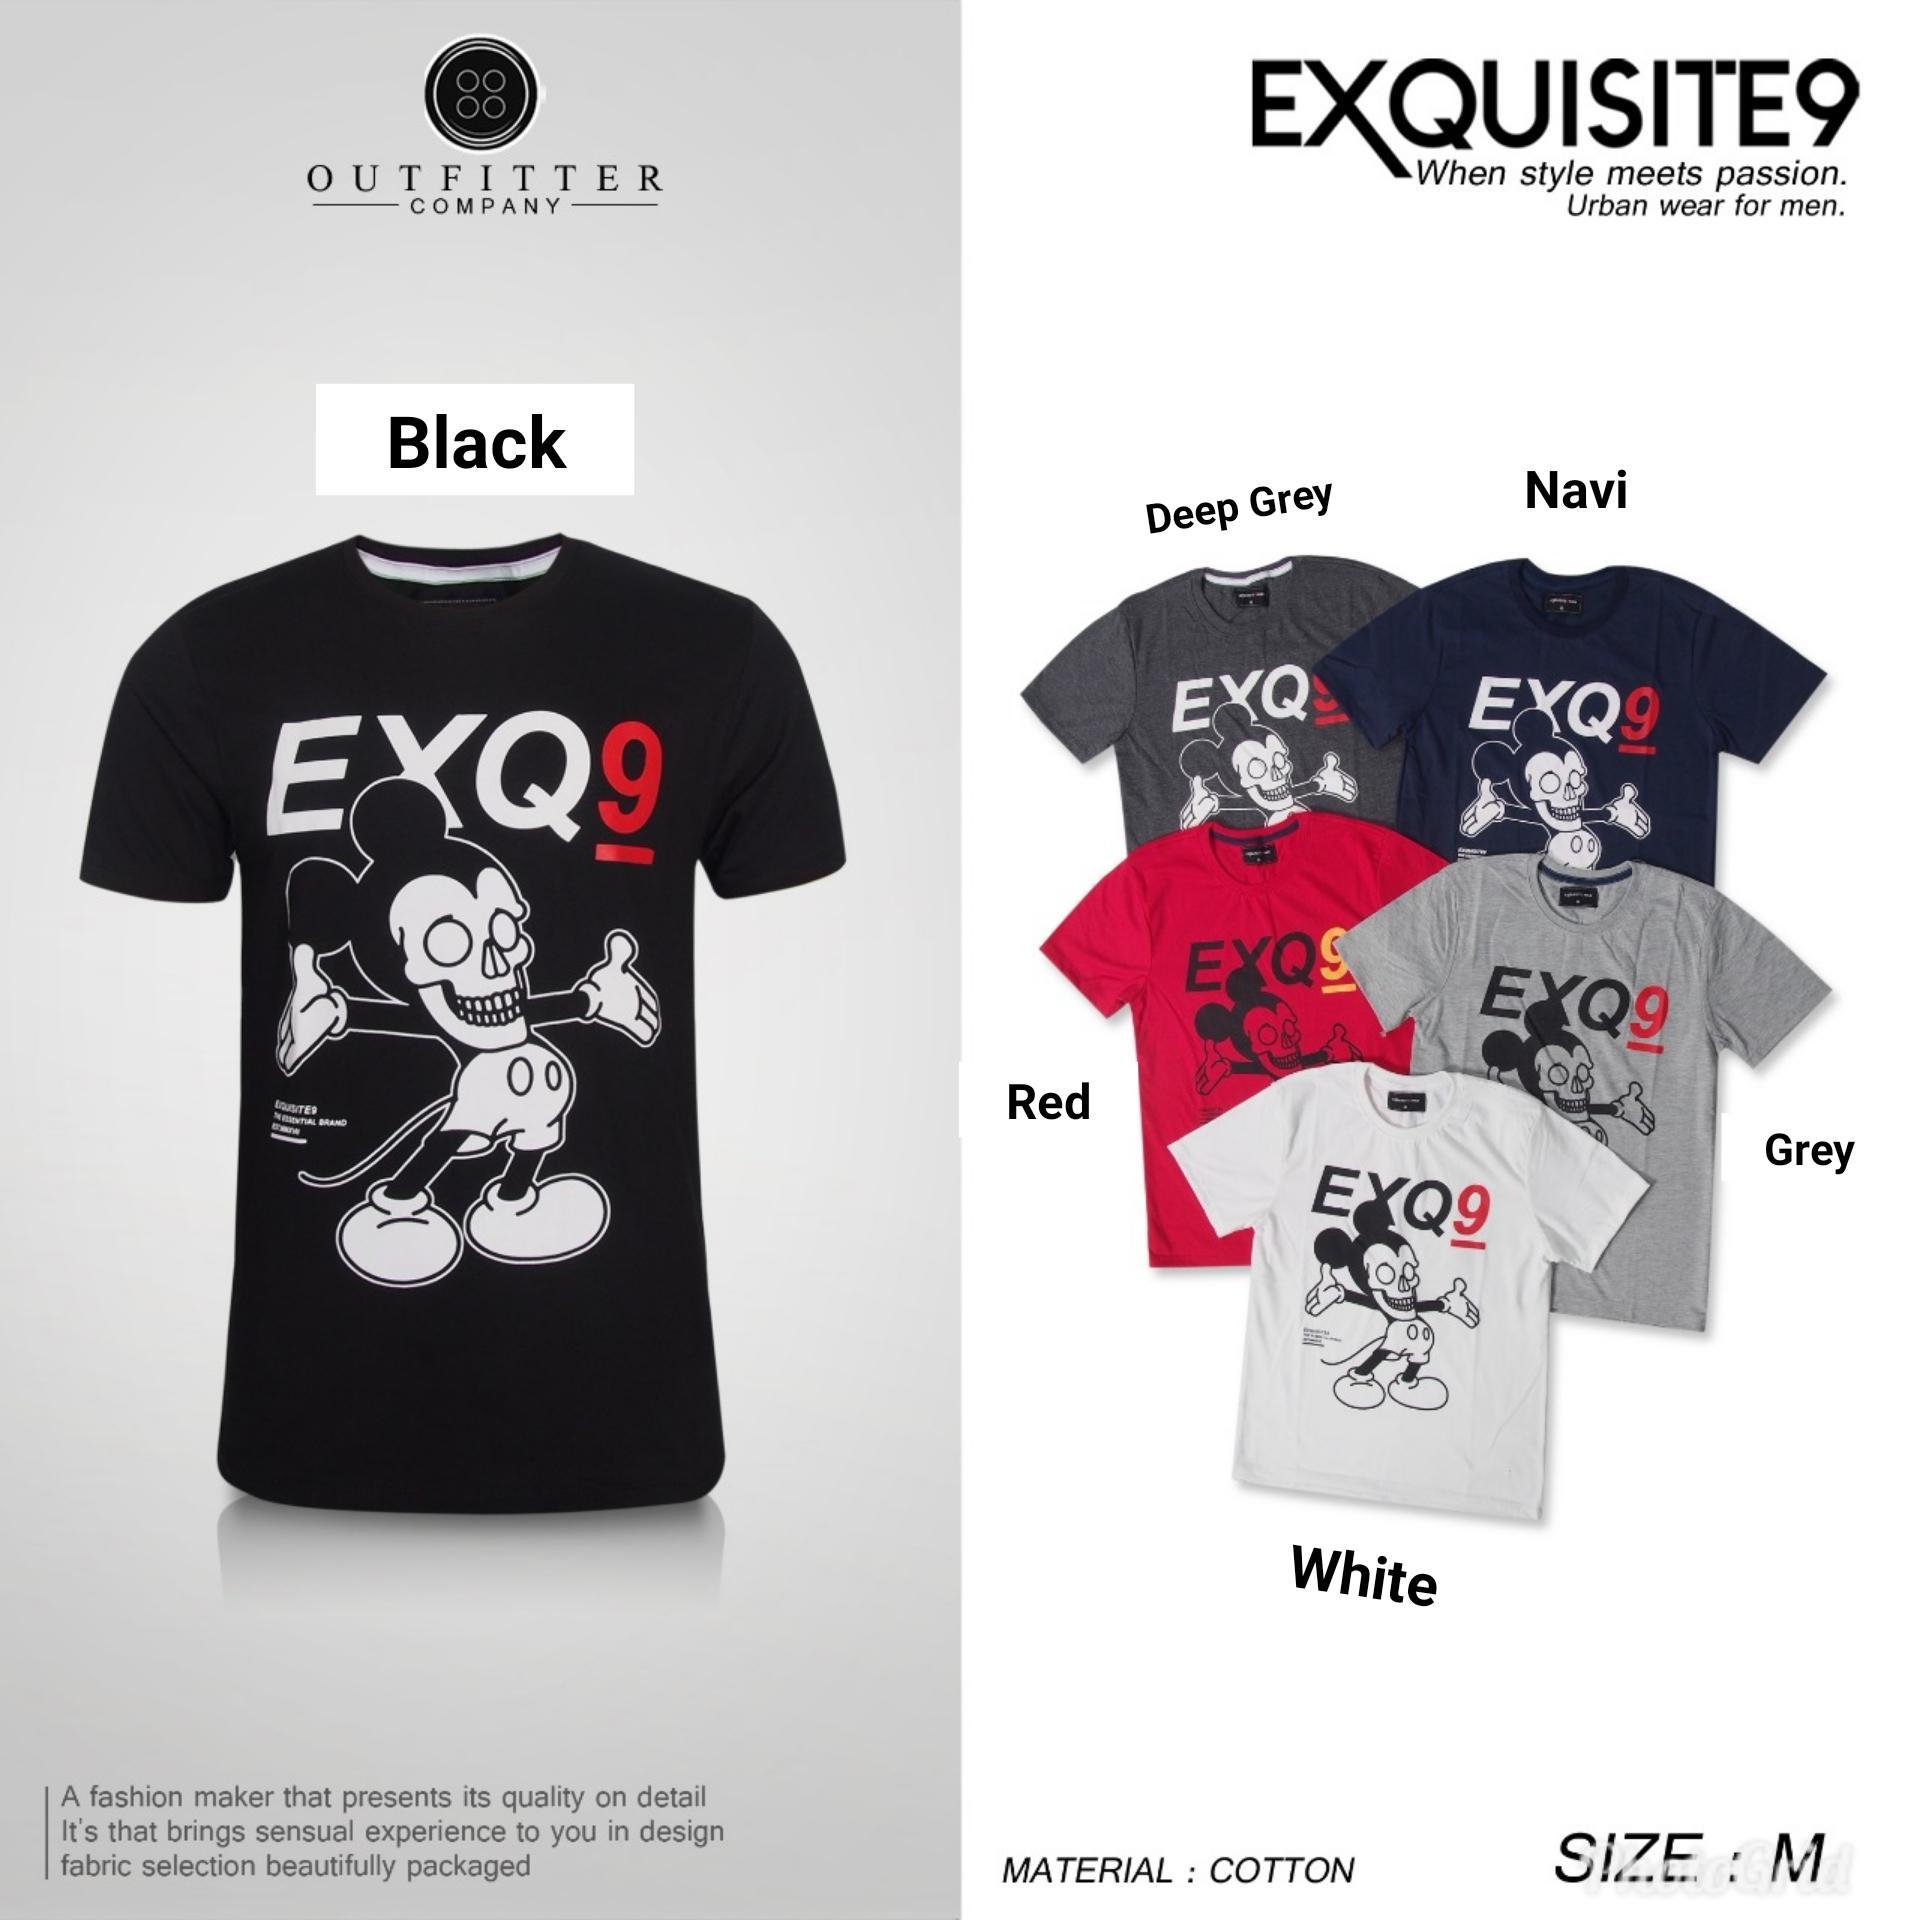 Glow fashion Atasan blouse kaos tshirt pria dewasa tangan pendek Ibnu/Distro/Tumbler Tee/Kaos Pria/Kaos Cowok